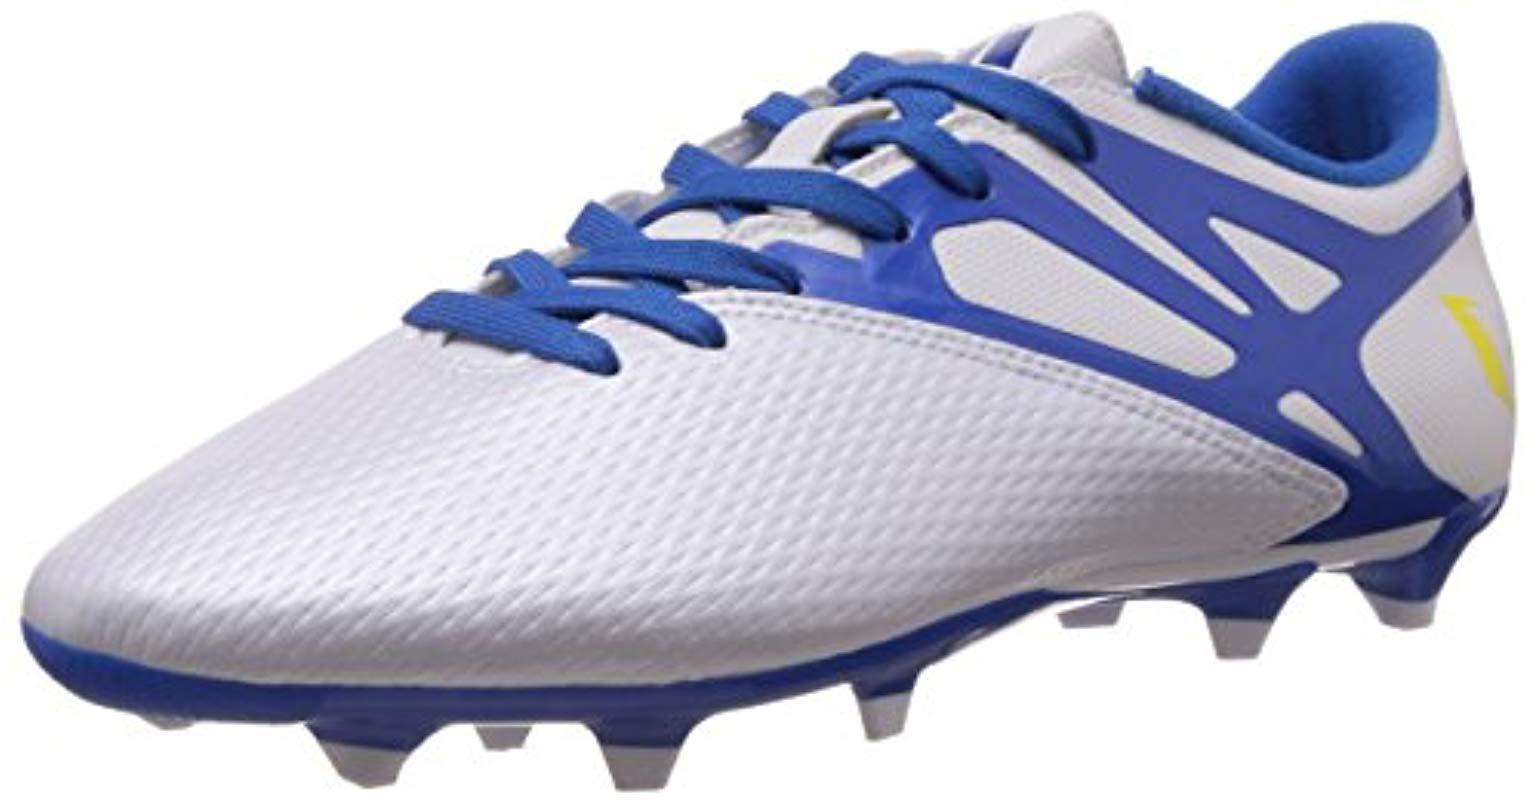 0c3f765d8b0b adidas. Men s Messi 15.3 Fg ag